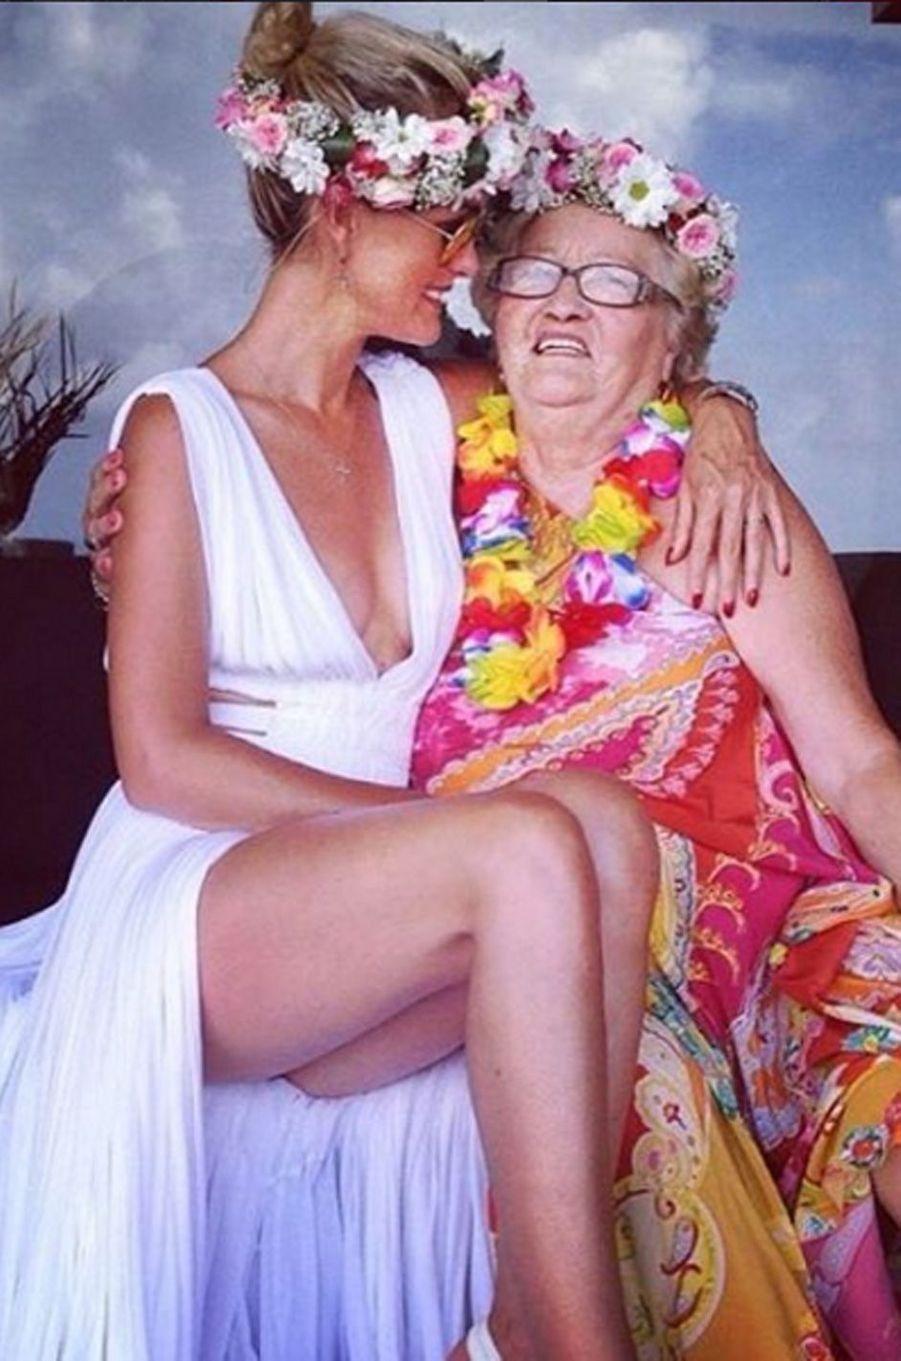 Laeticia Hallyday célébrant son anniversaire avec sa grand-mère